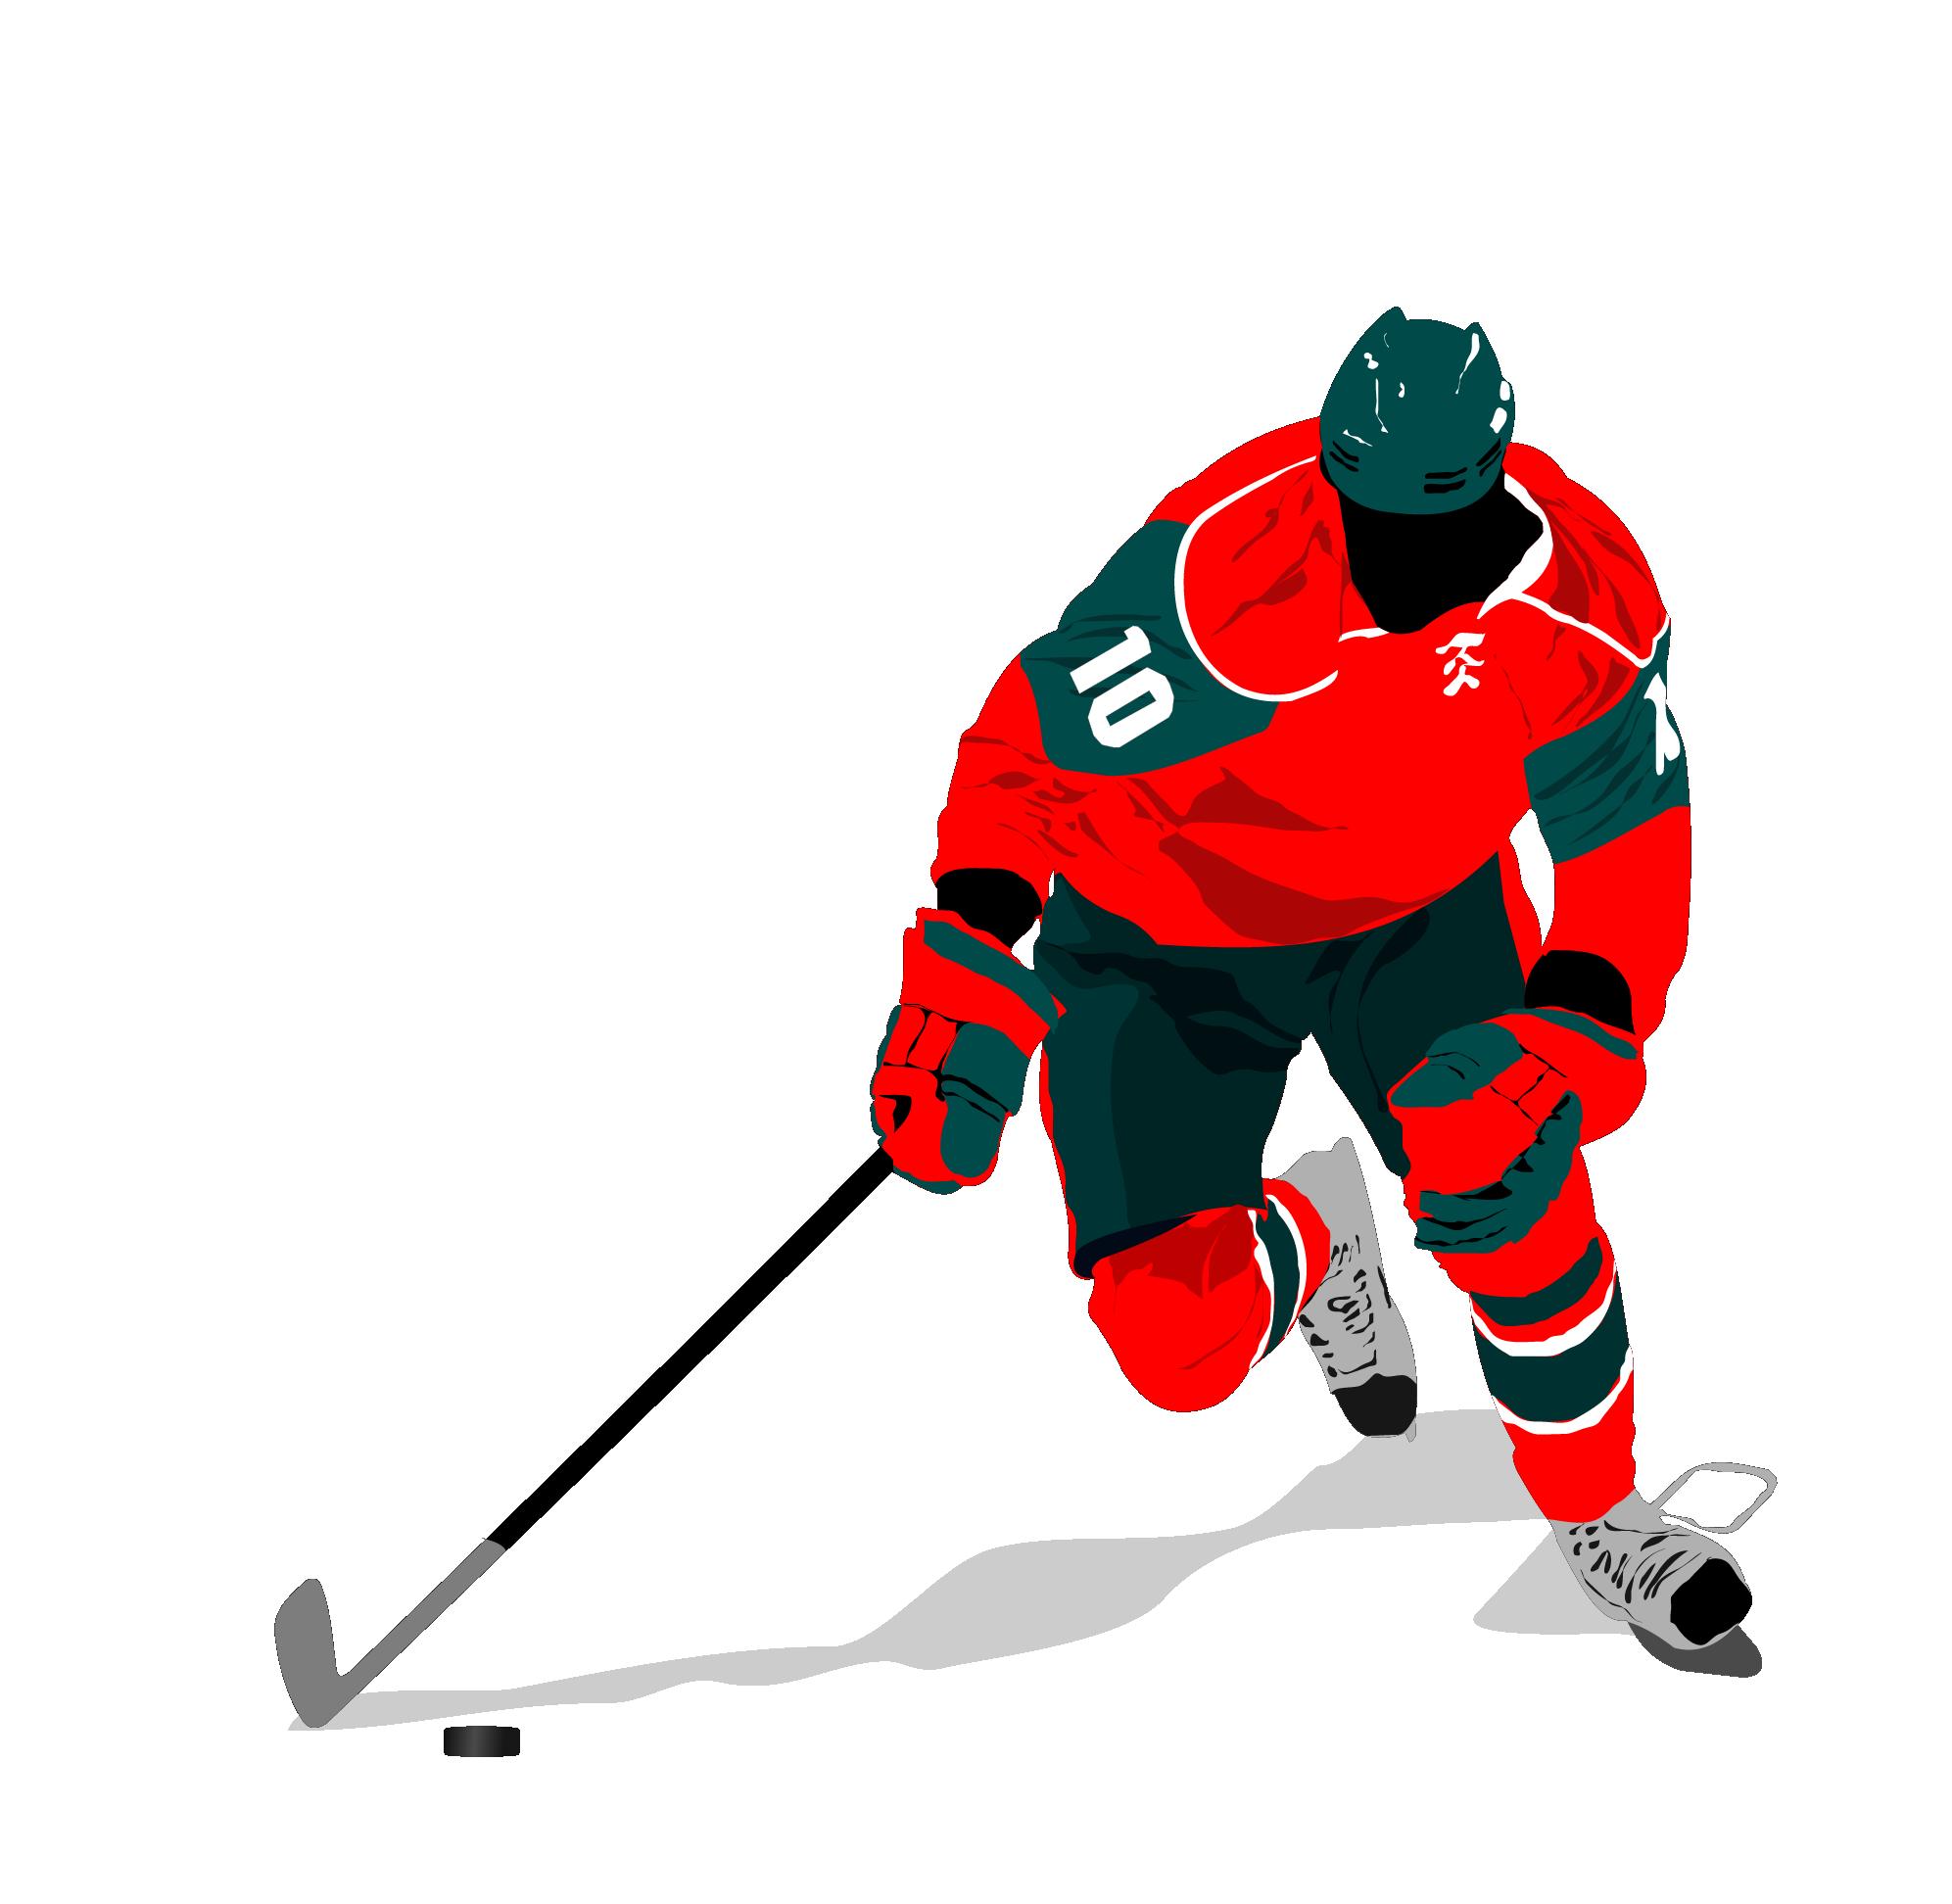 Hockey clipart hockey canada. Pittsburgh penguins ice player